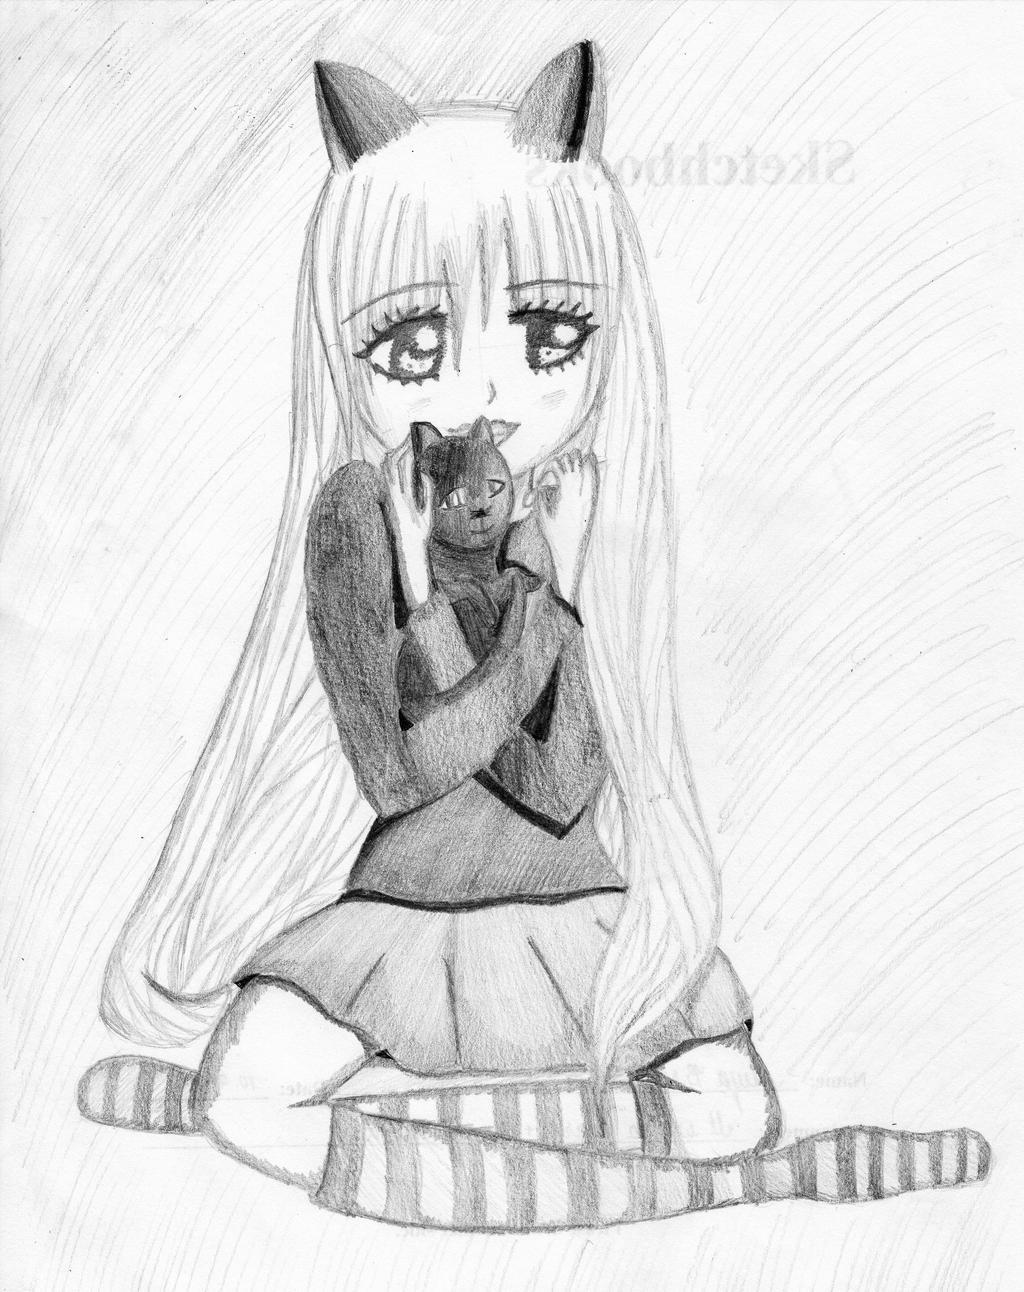 Cute Cat Girl by SketchArt2 on DeviantArt